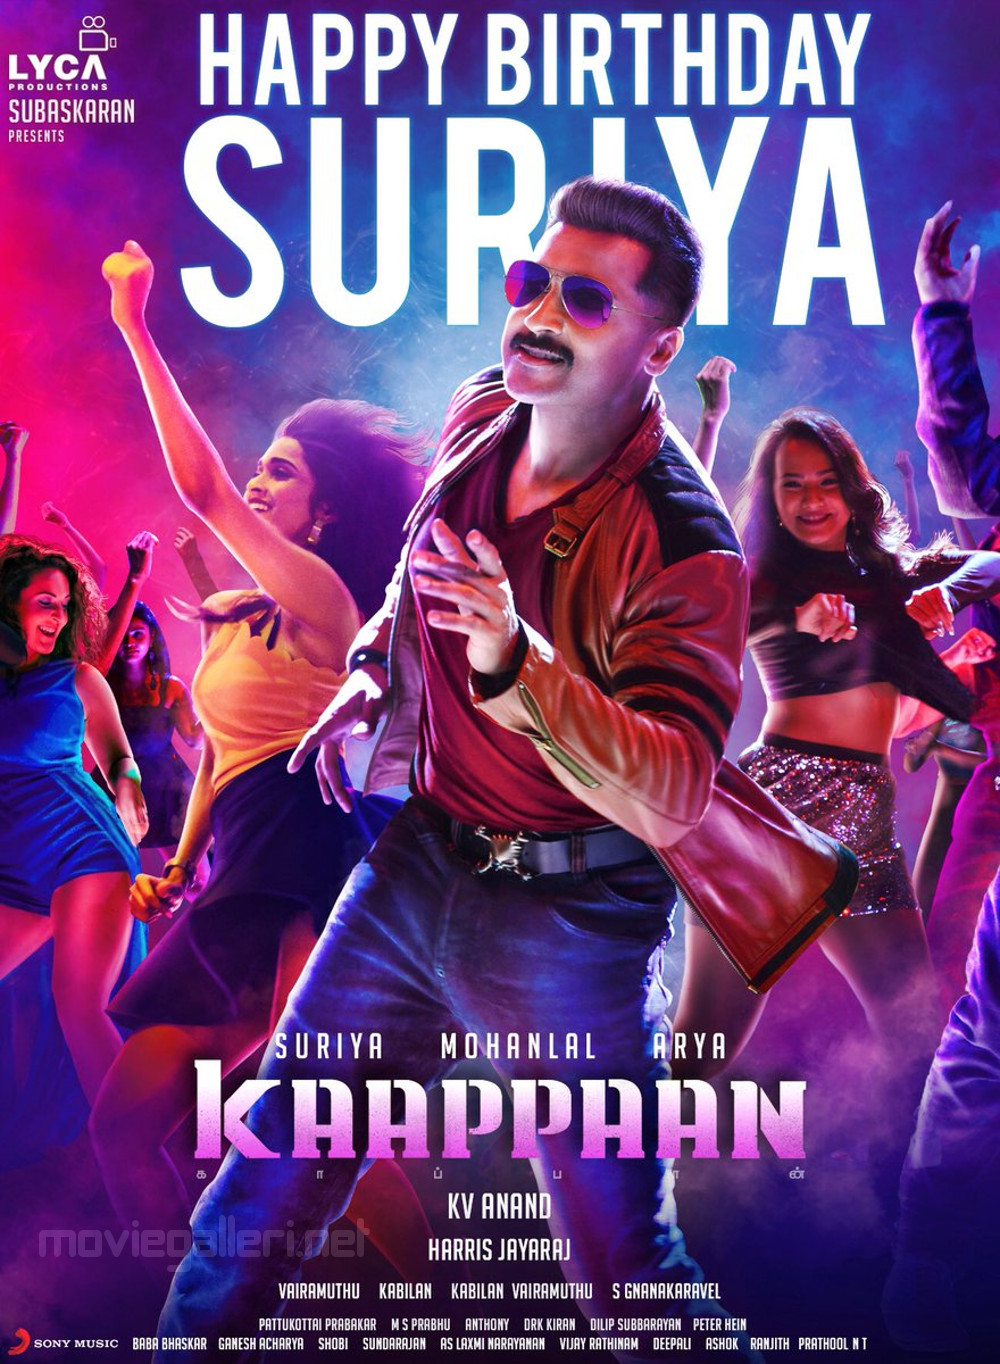 Kaappaan Suriya Birthday Wishes Poster